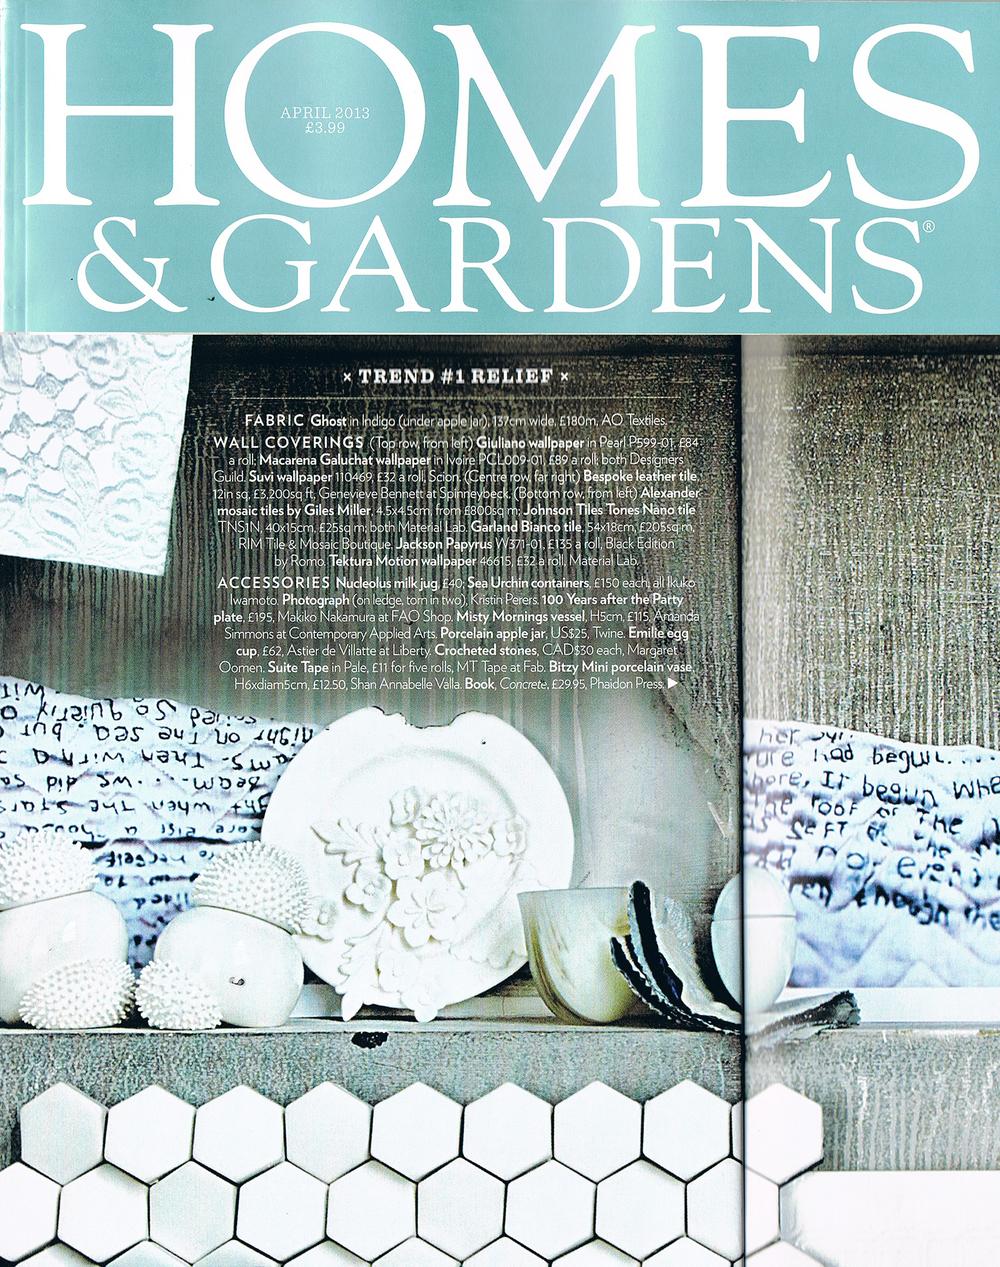 Homes and gardens- april 2013 press ready.jpg